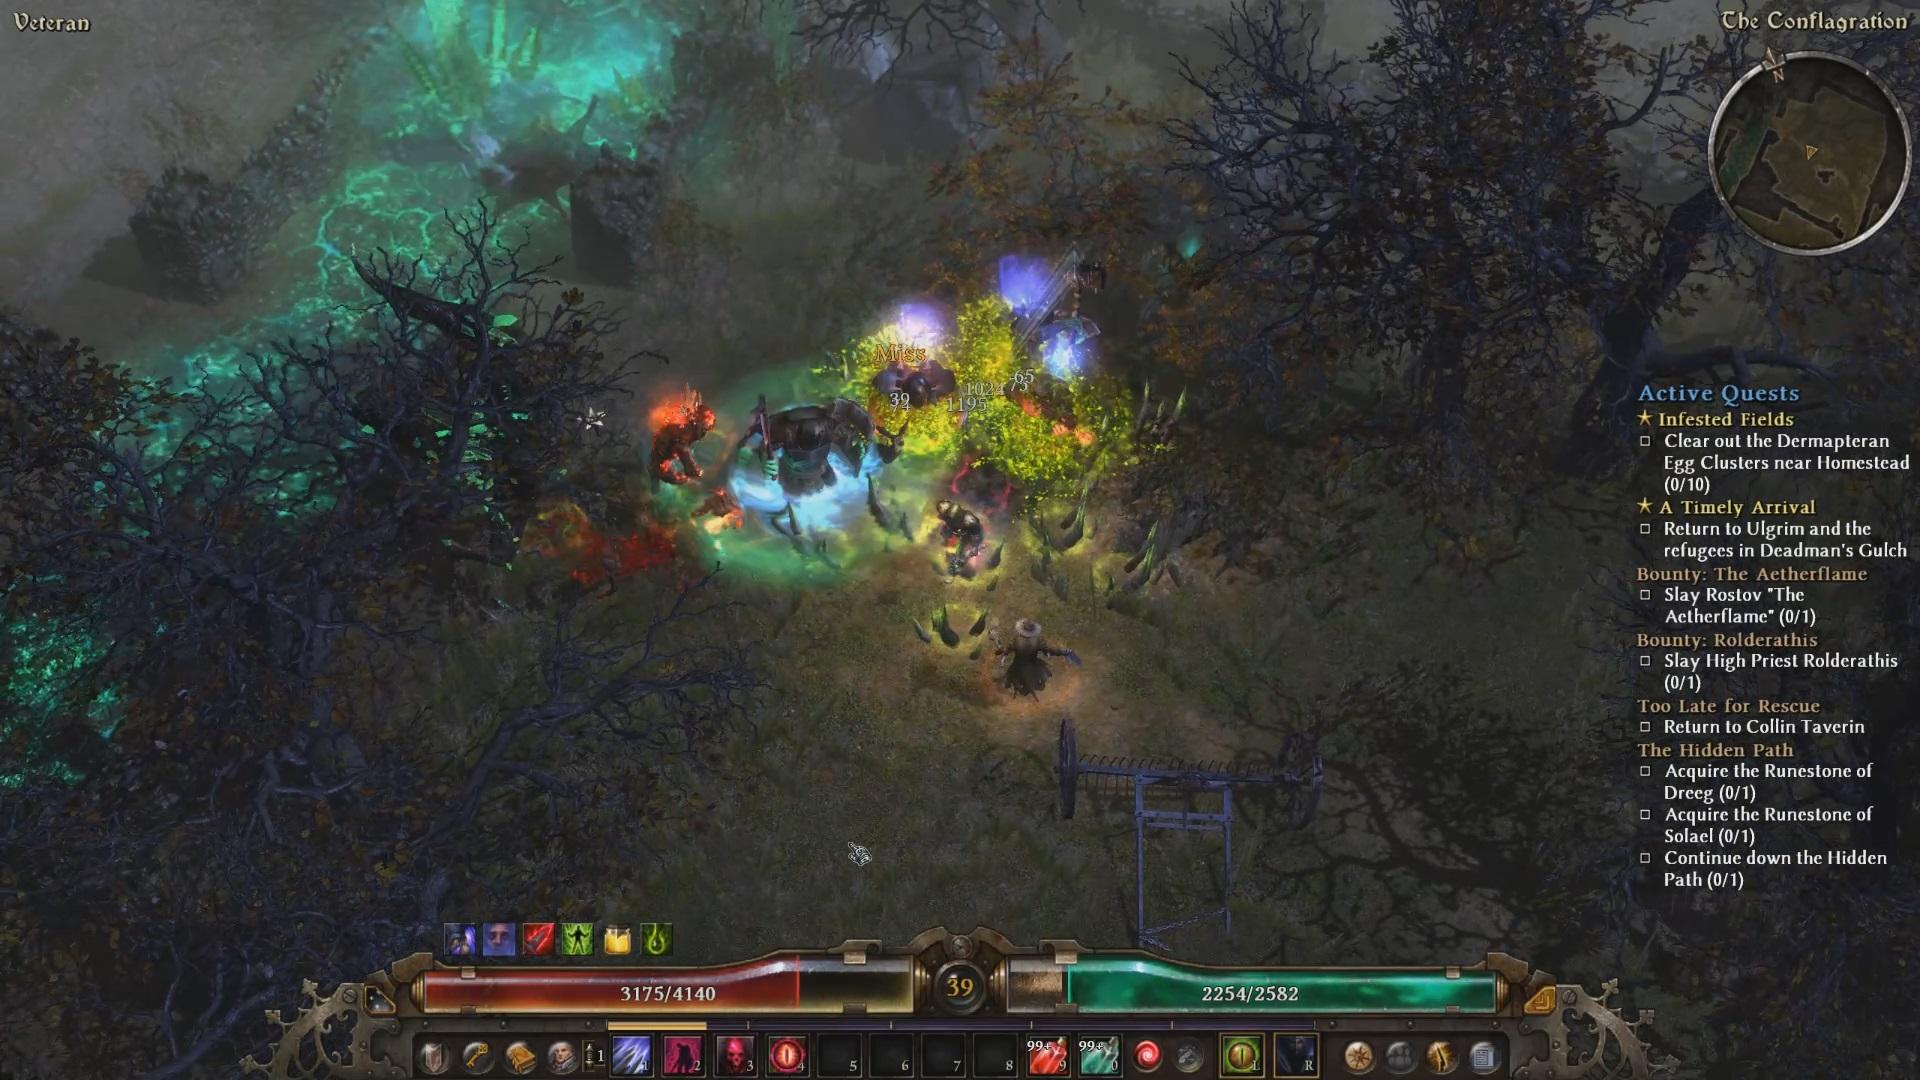 Grim Dawn Map Interactive Related Keywords & Suggestions - Grim Dawn